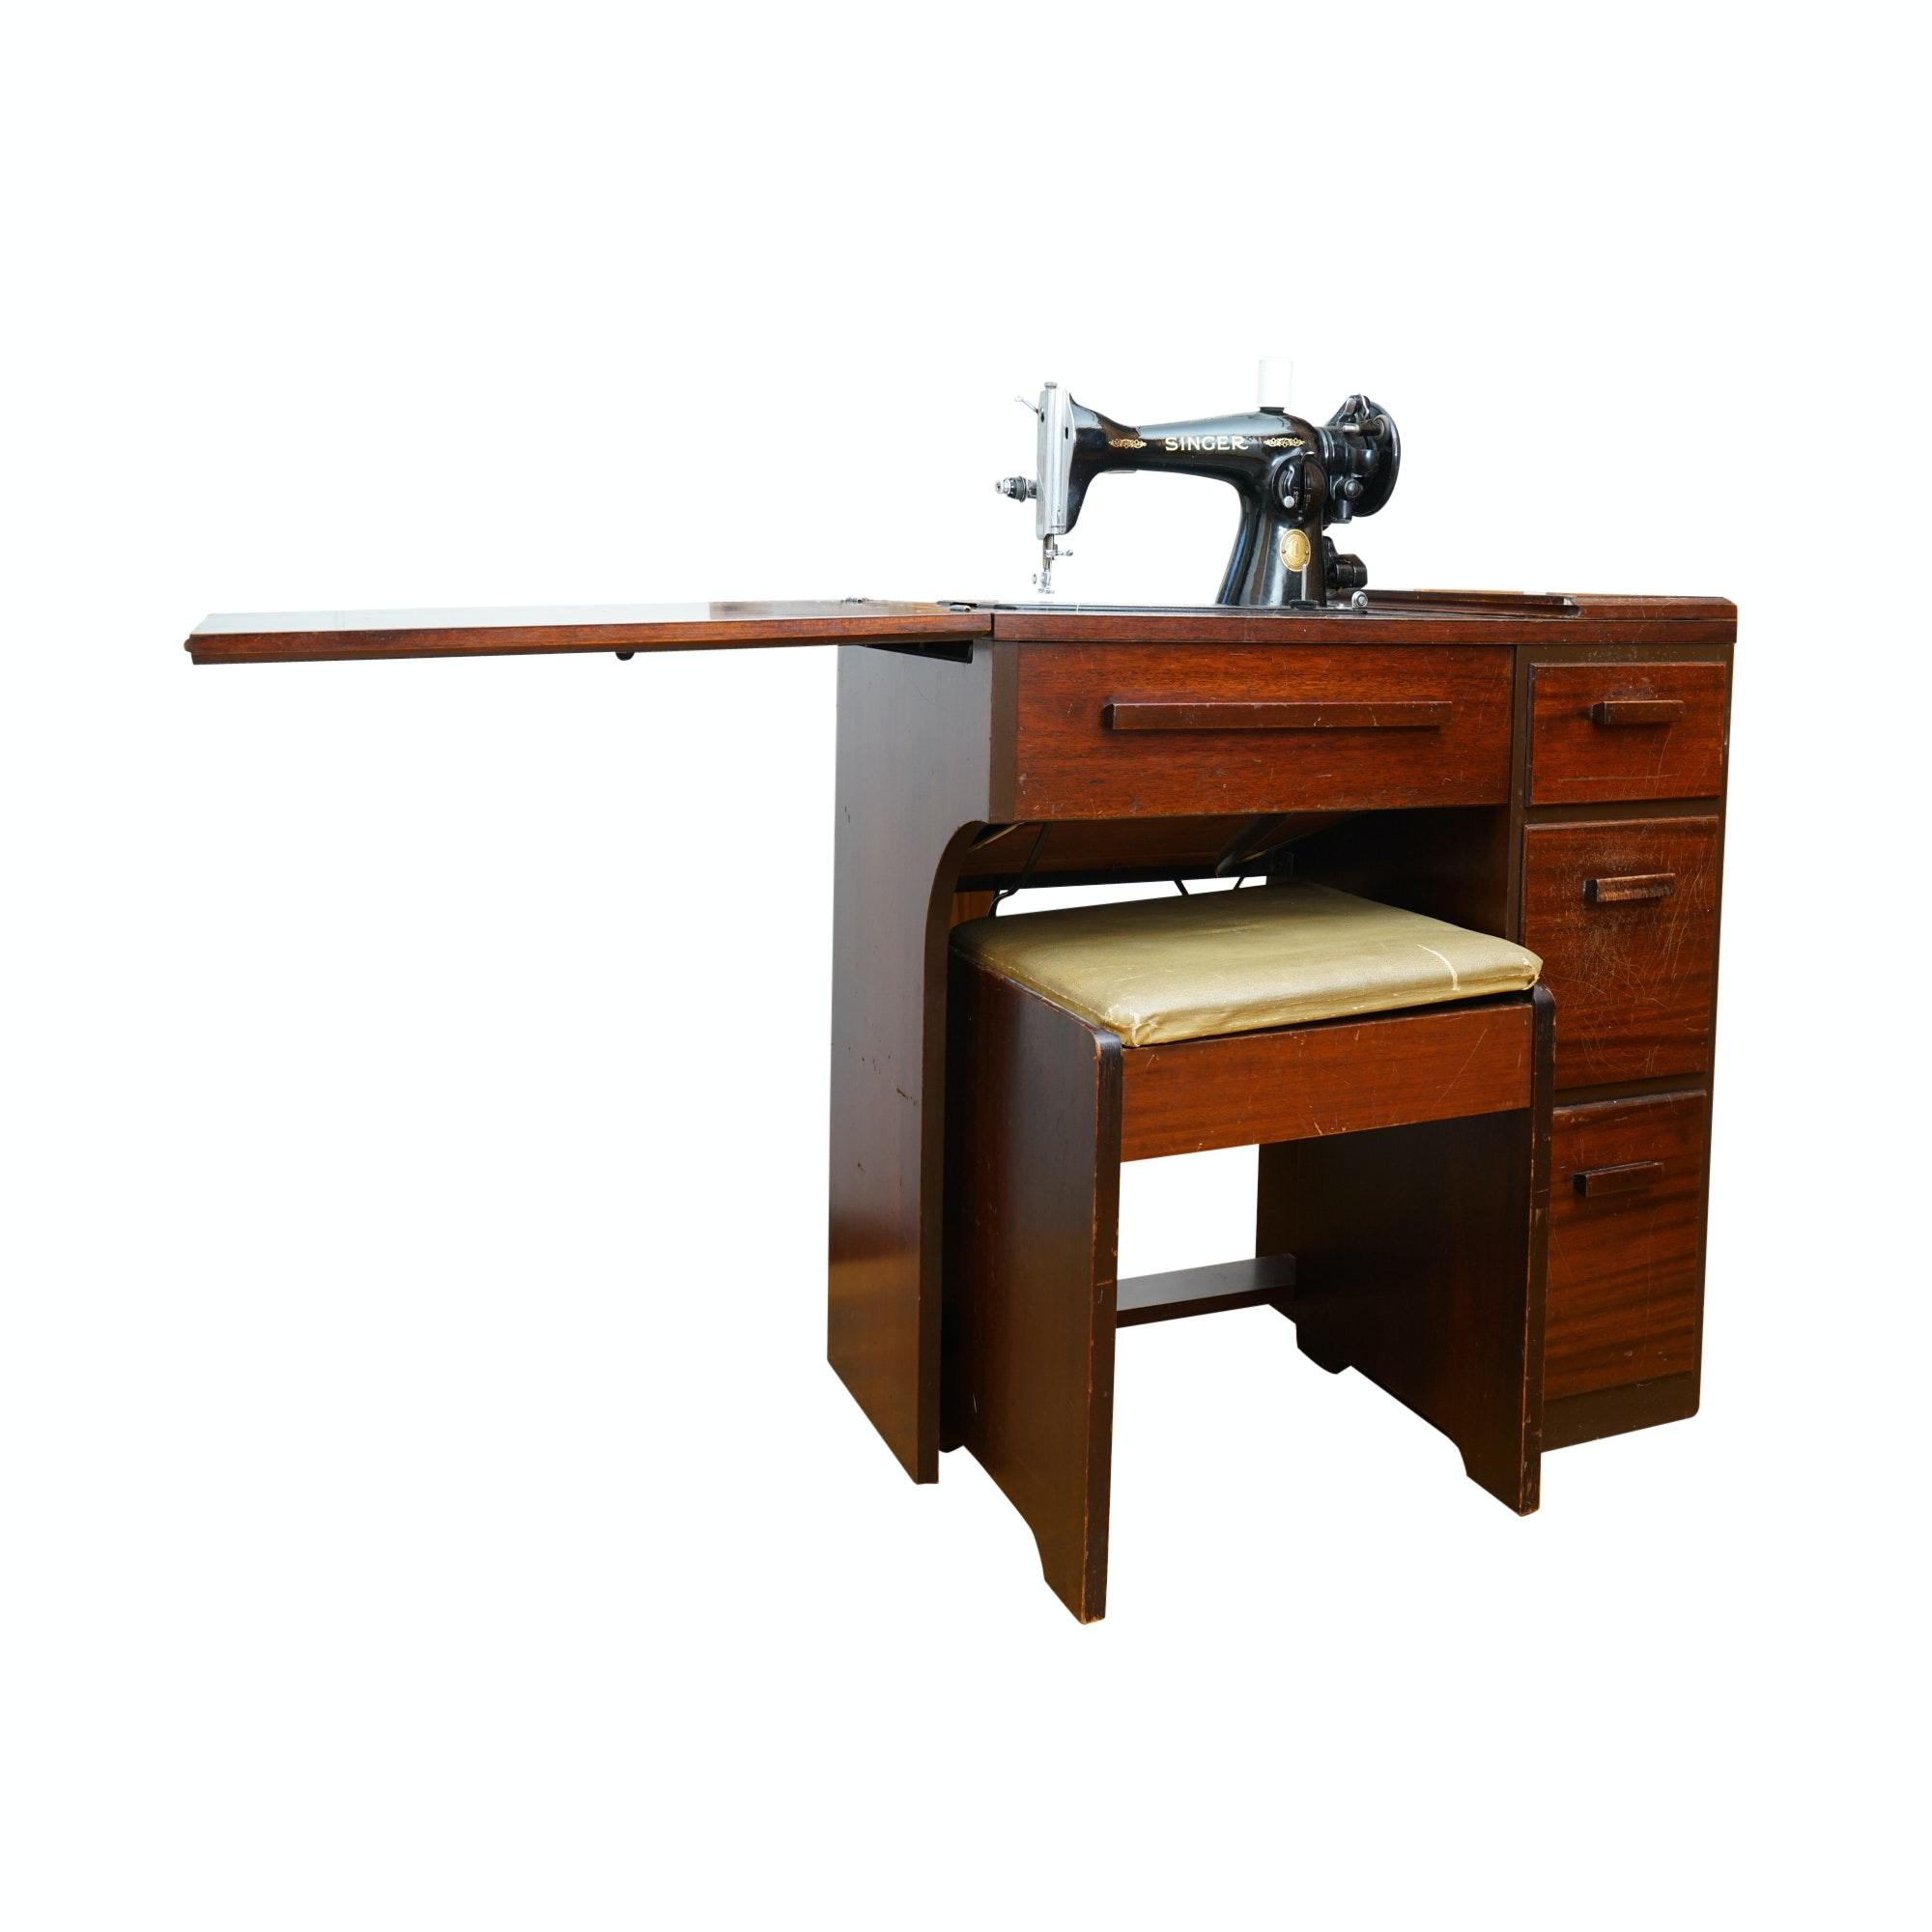 Vintage Singer Sewing Machine and Mahogany Desk ca. 1948-54